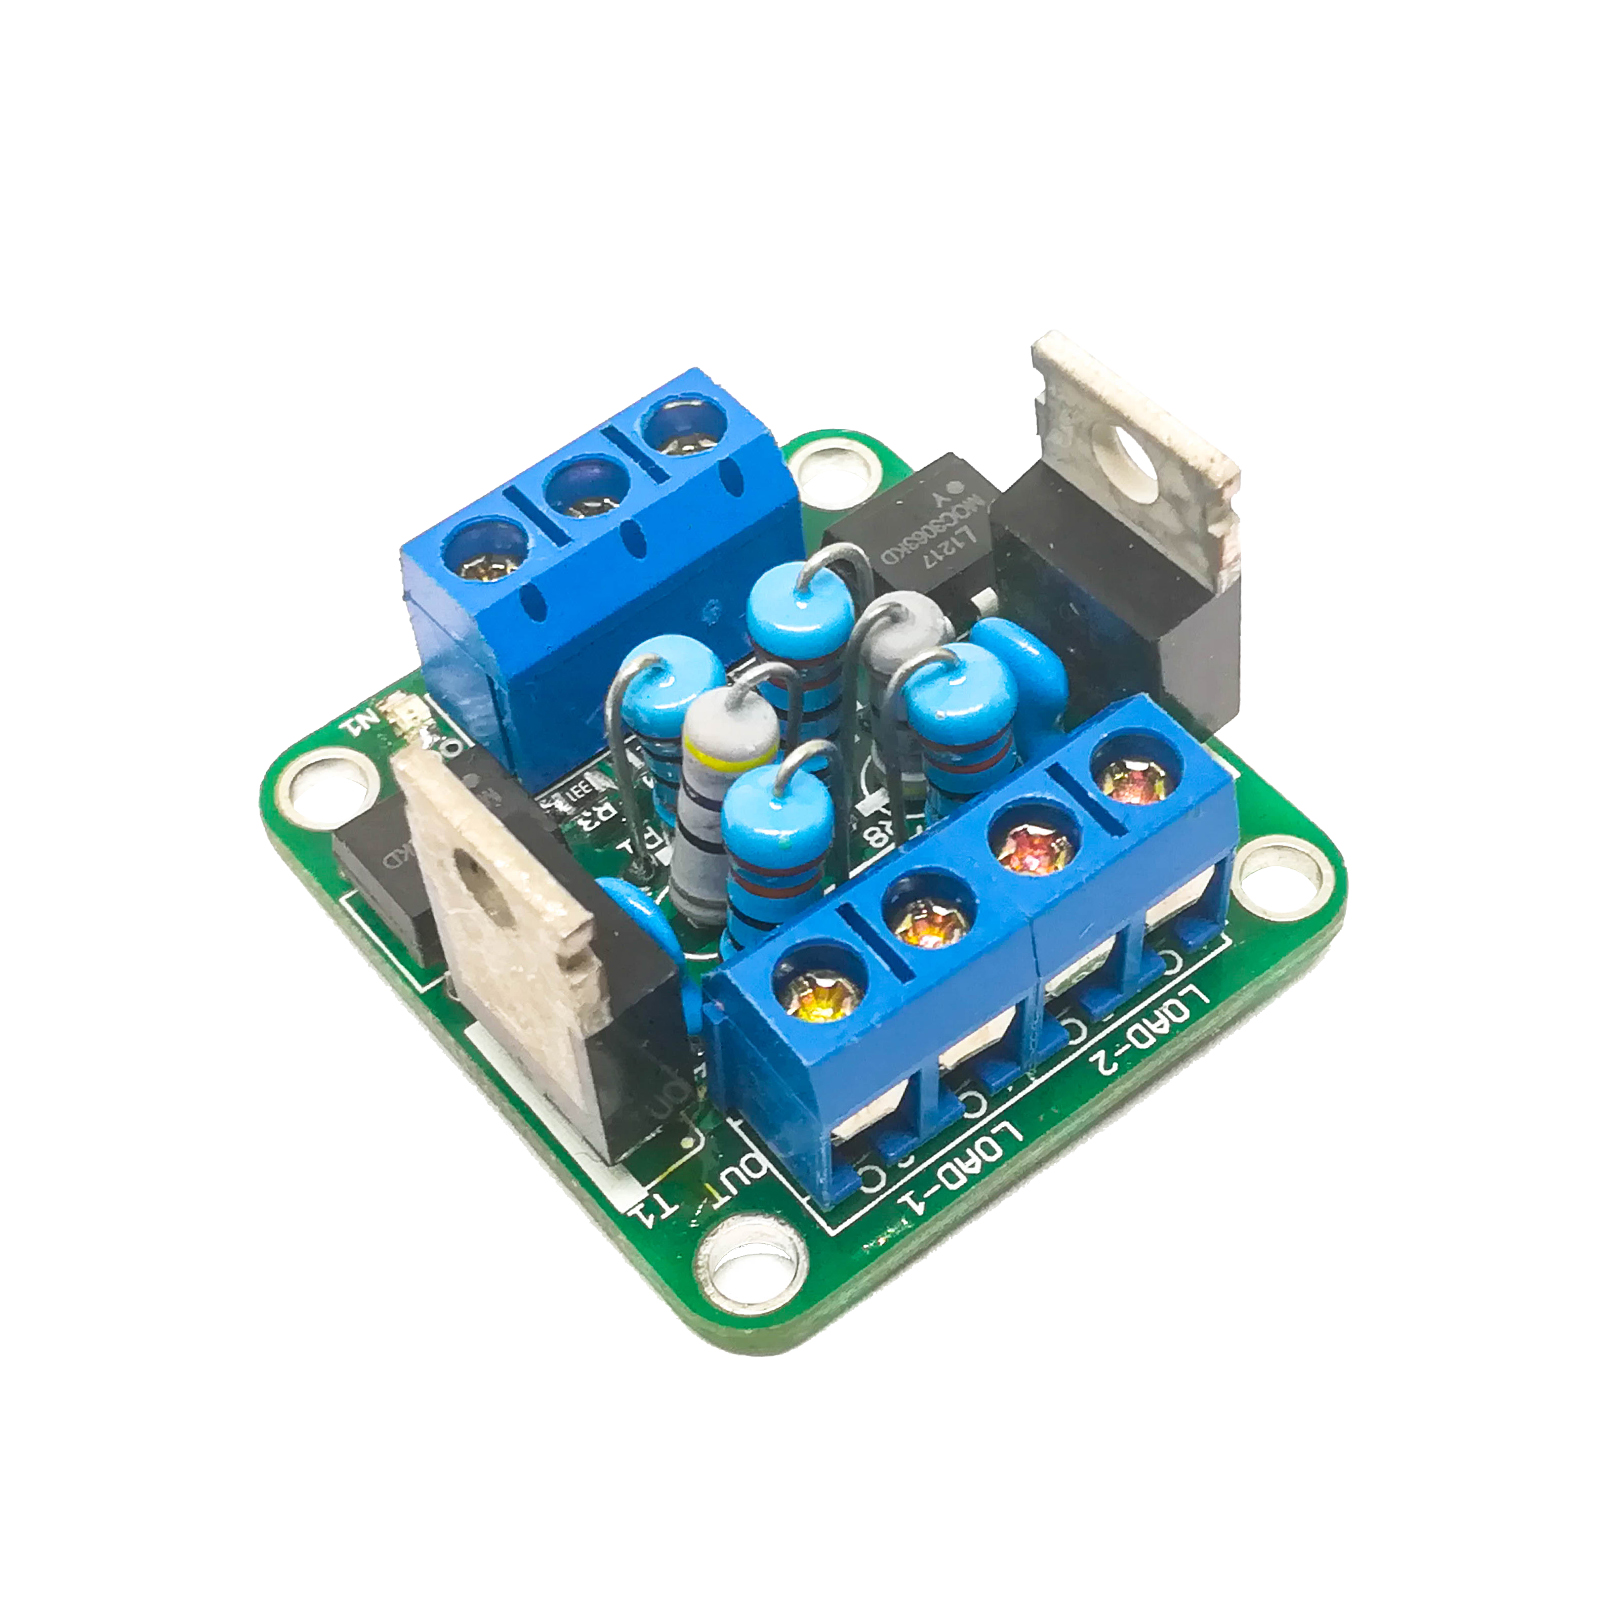 Dual Channel Opto Isolated Triac Module Aptinex Arduino Ac Light Dimmer Circuits Circuit Scr Home Power Control Modules